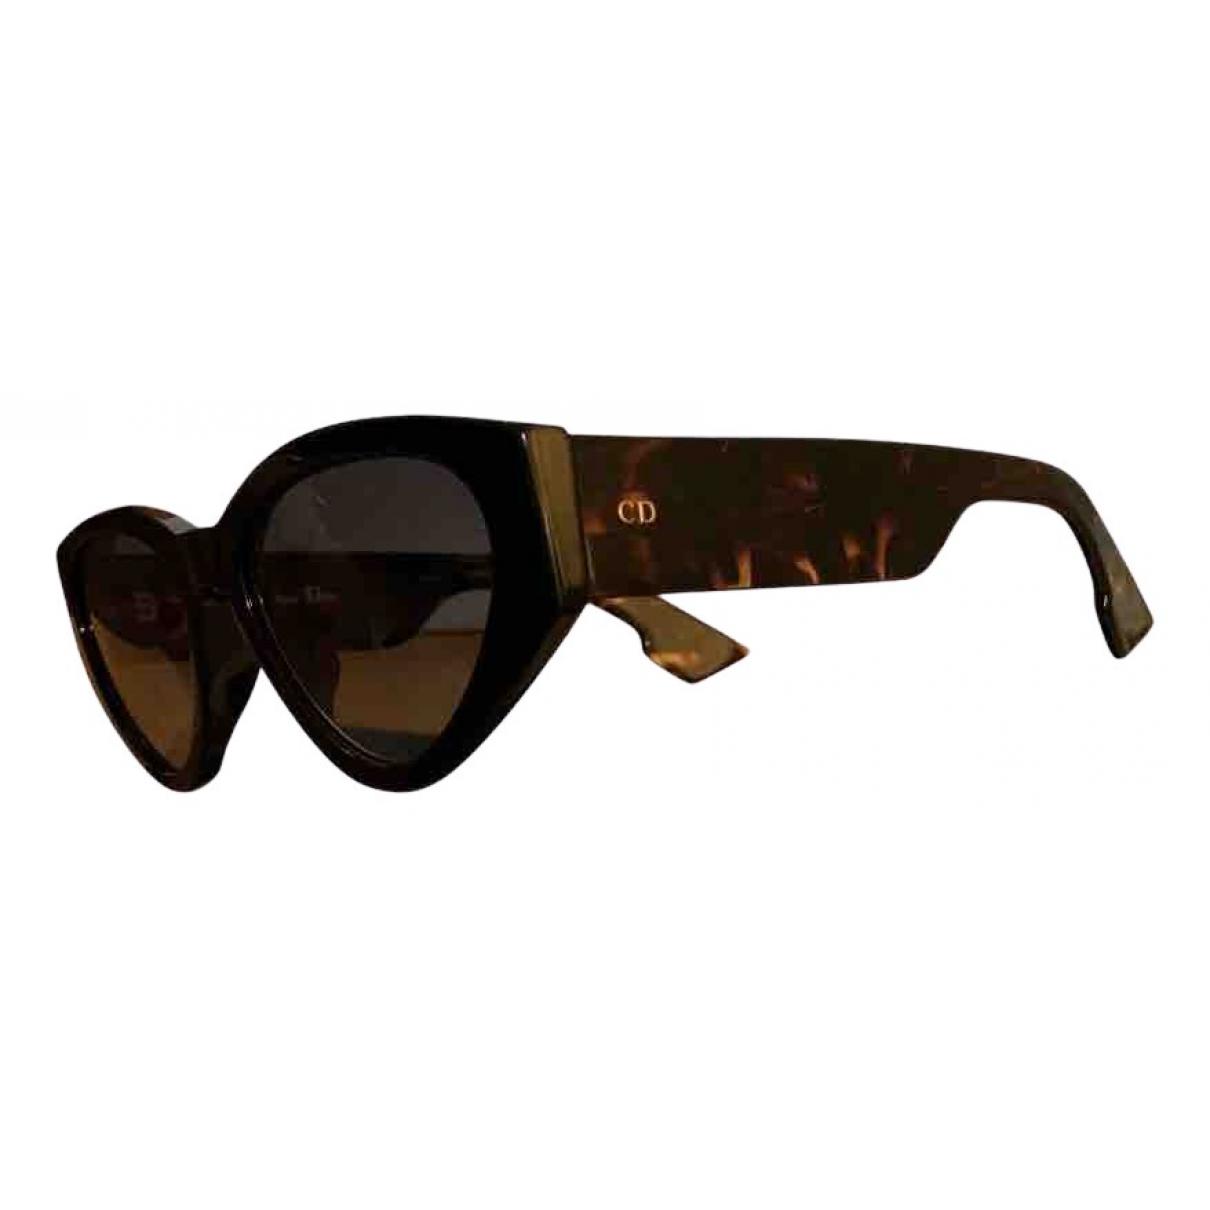 Gafas oversize CatstyleDior1 Dior